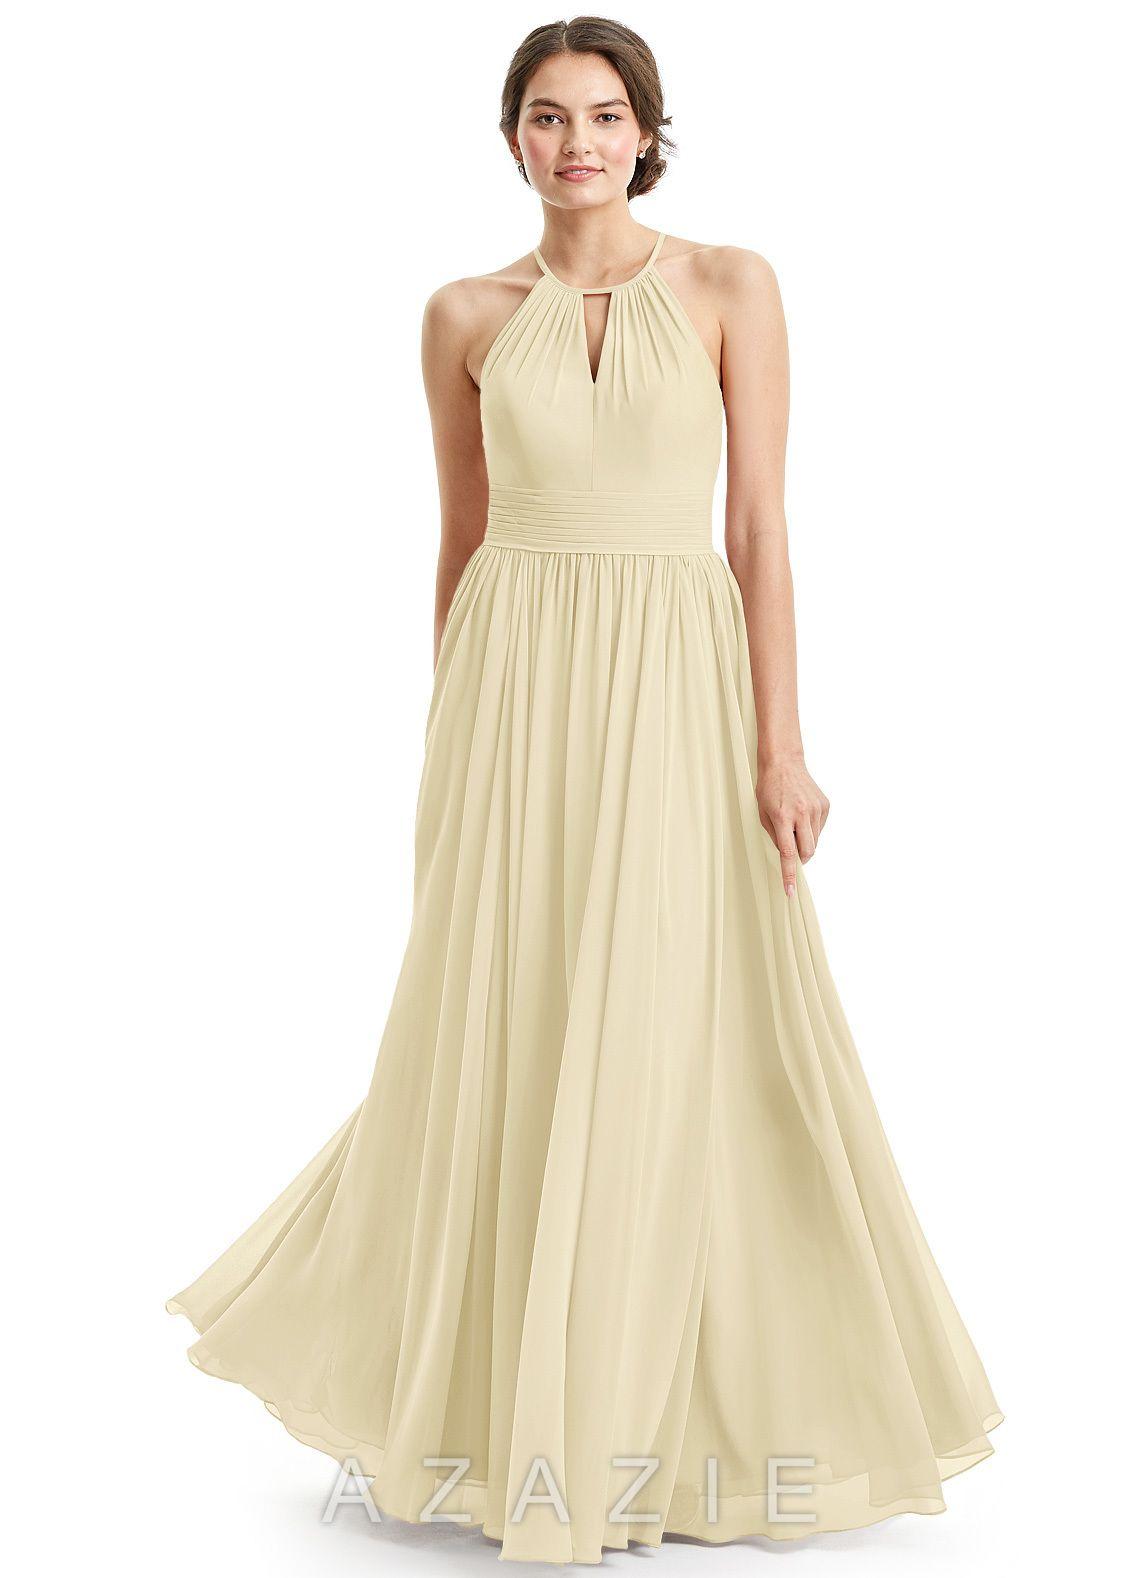 4830edc81aa Azazie Cherish Bridesmaid Dress